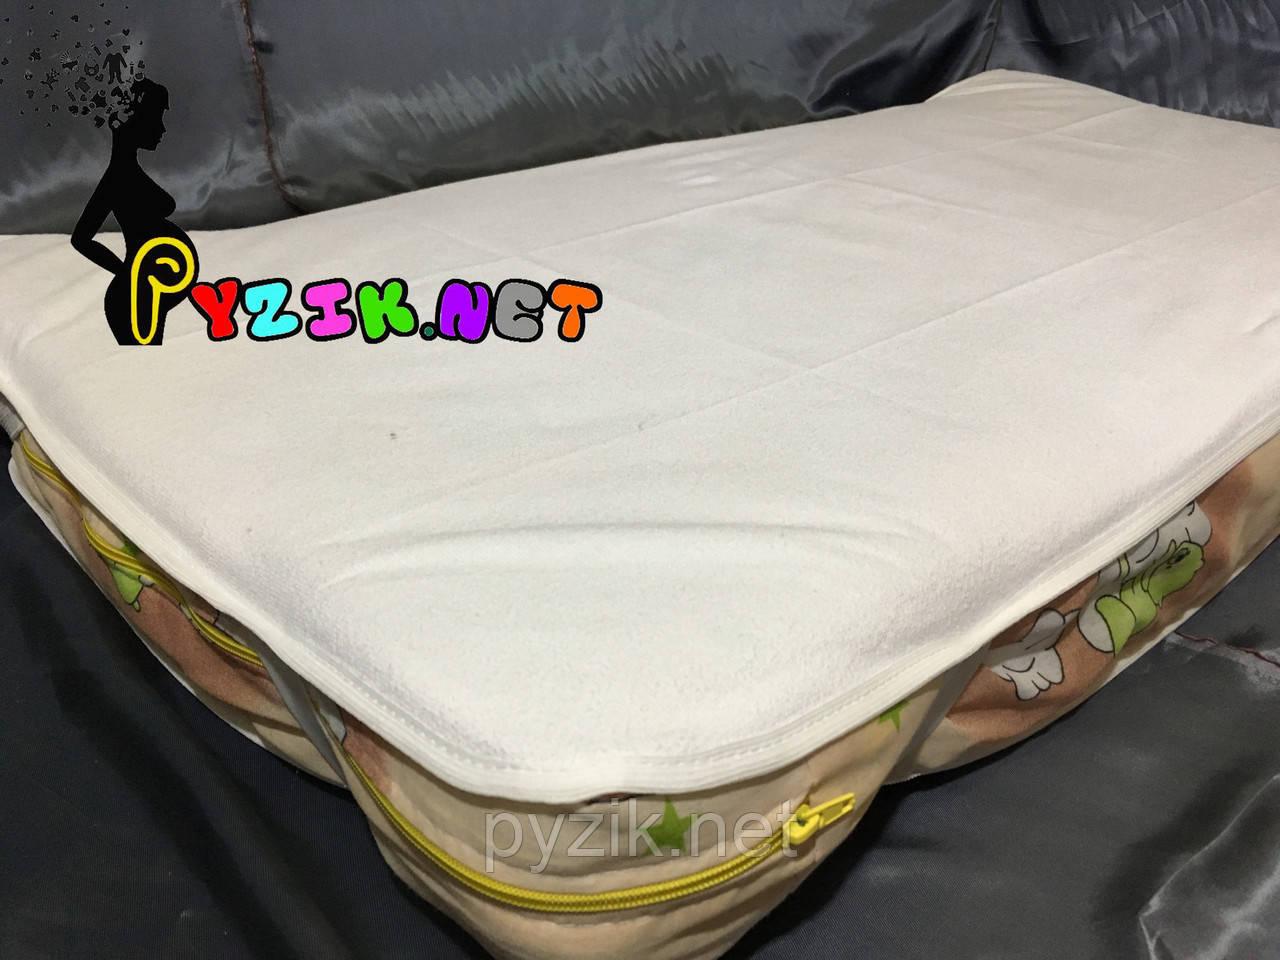 Наматрасник непромокаемый 120х60 см, резинка по углам белый